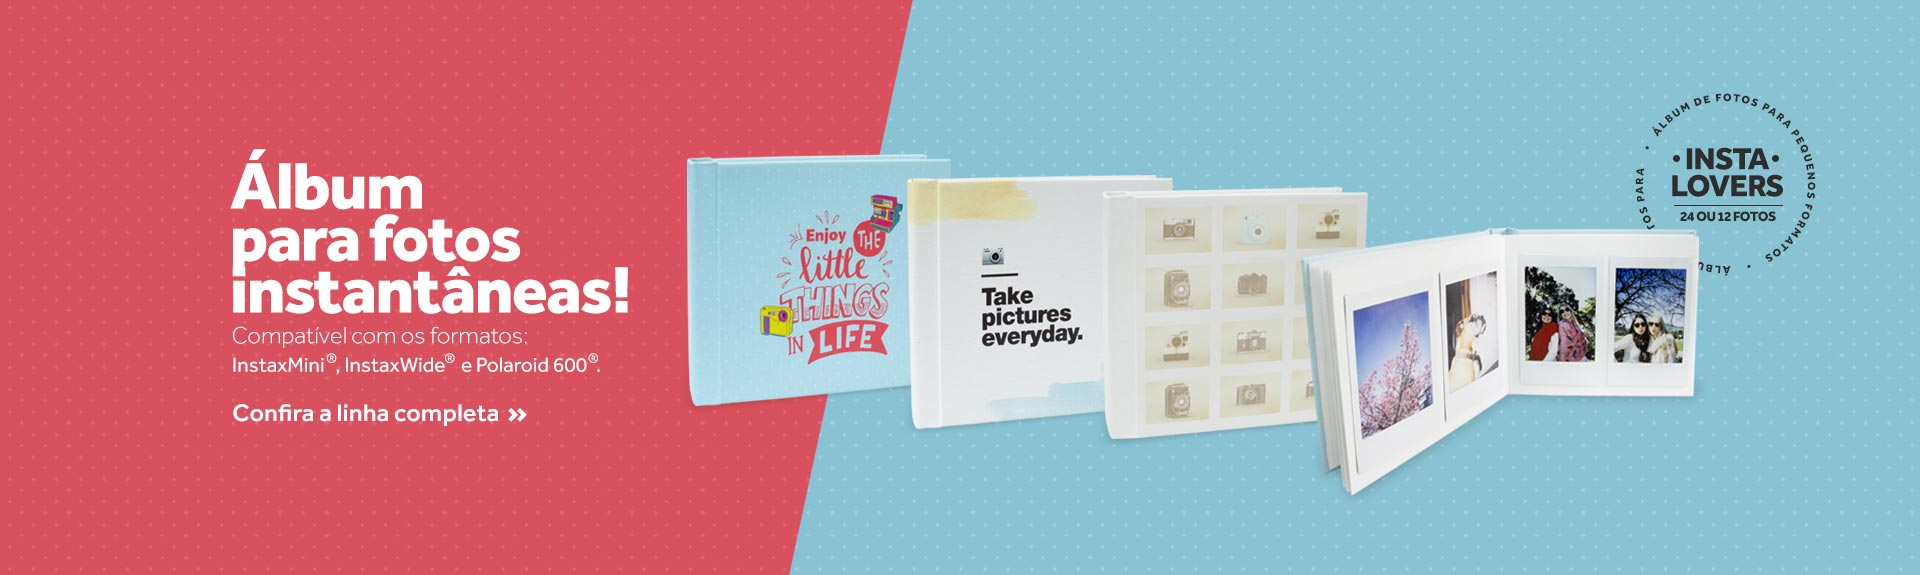 álbuns de fotos compactos e práticos ideais para guardar fotos instantâneas